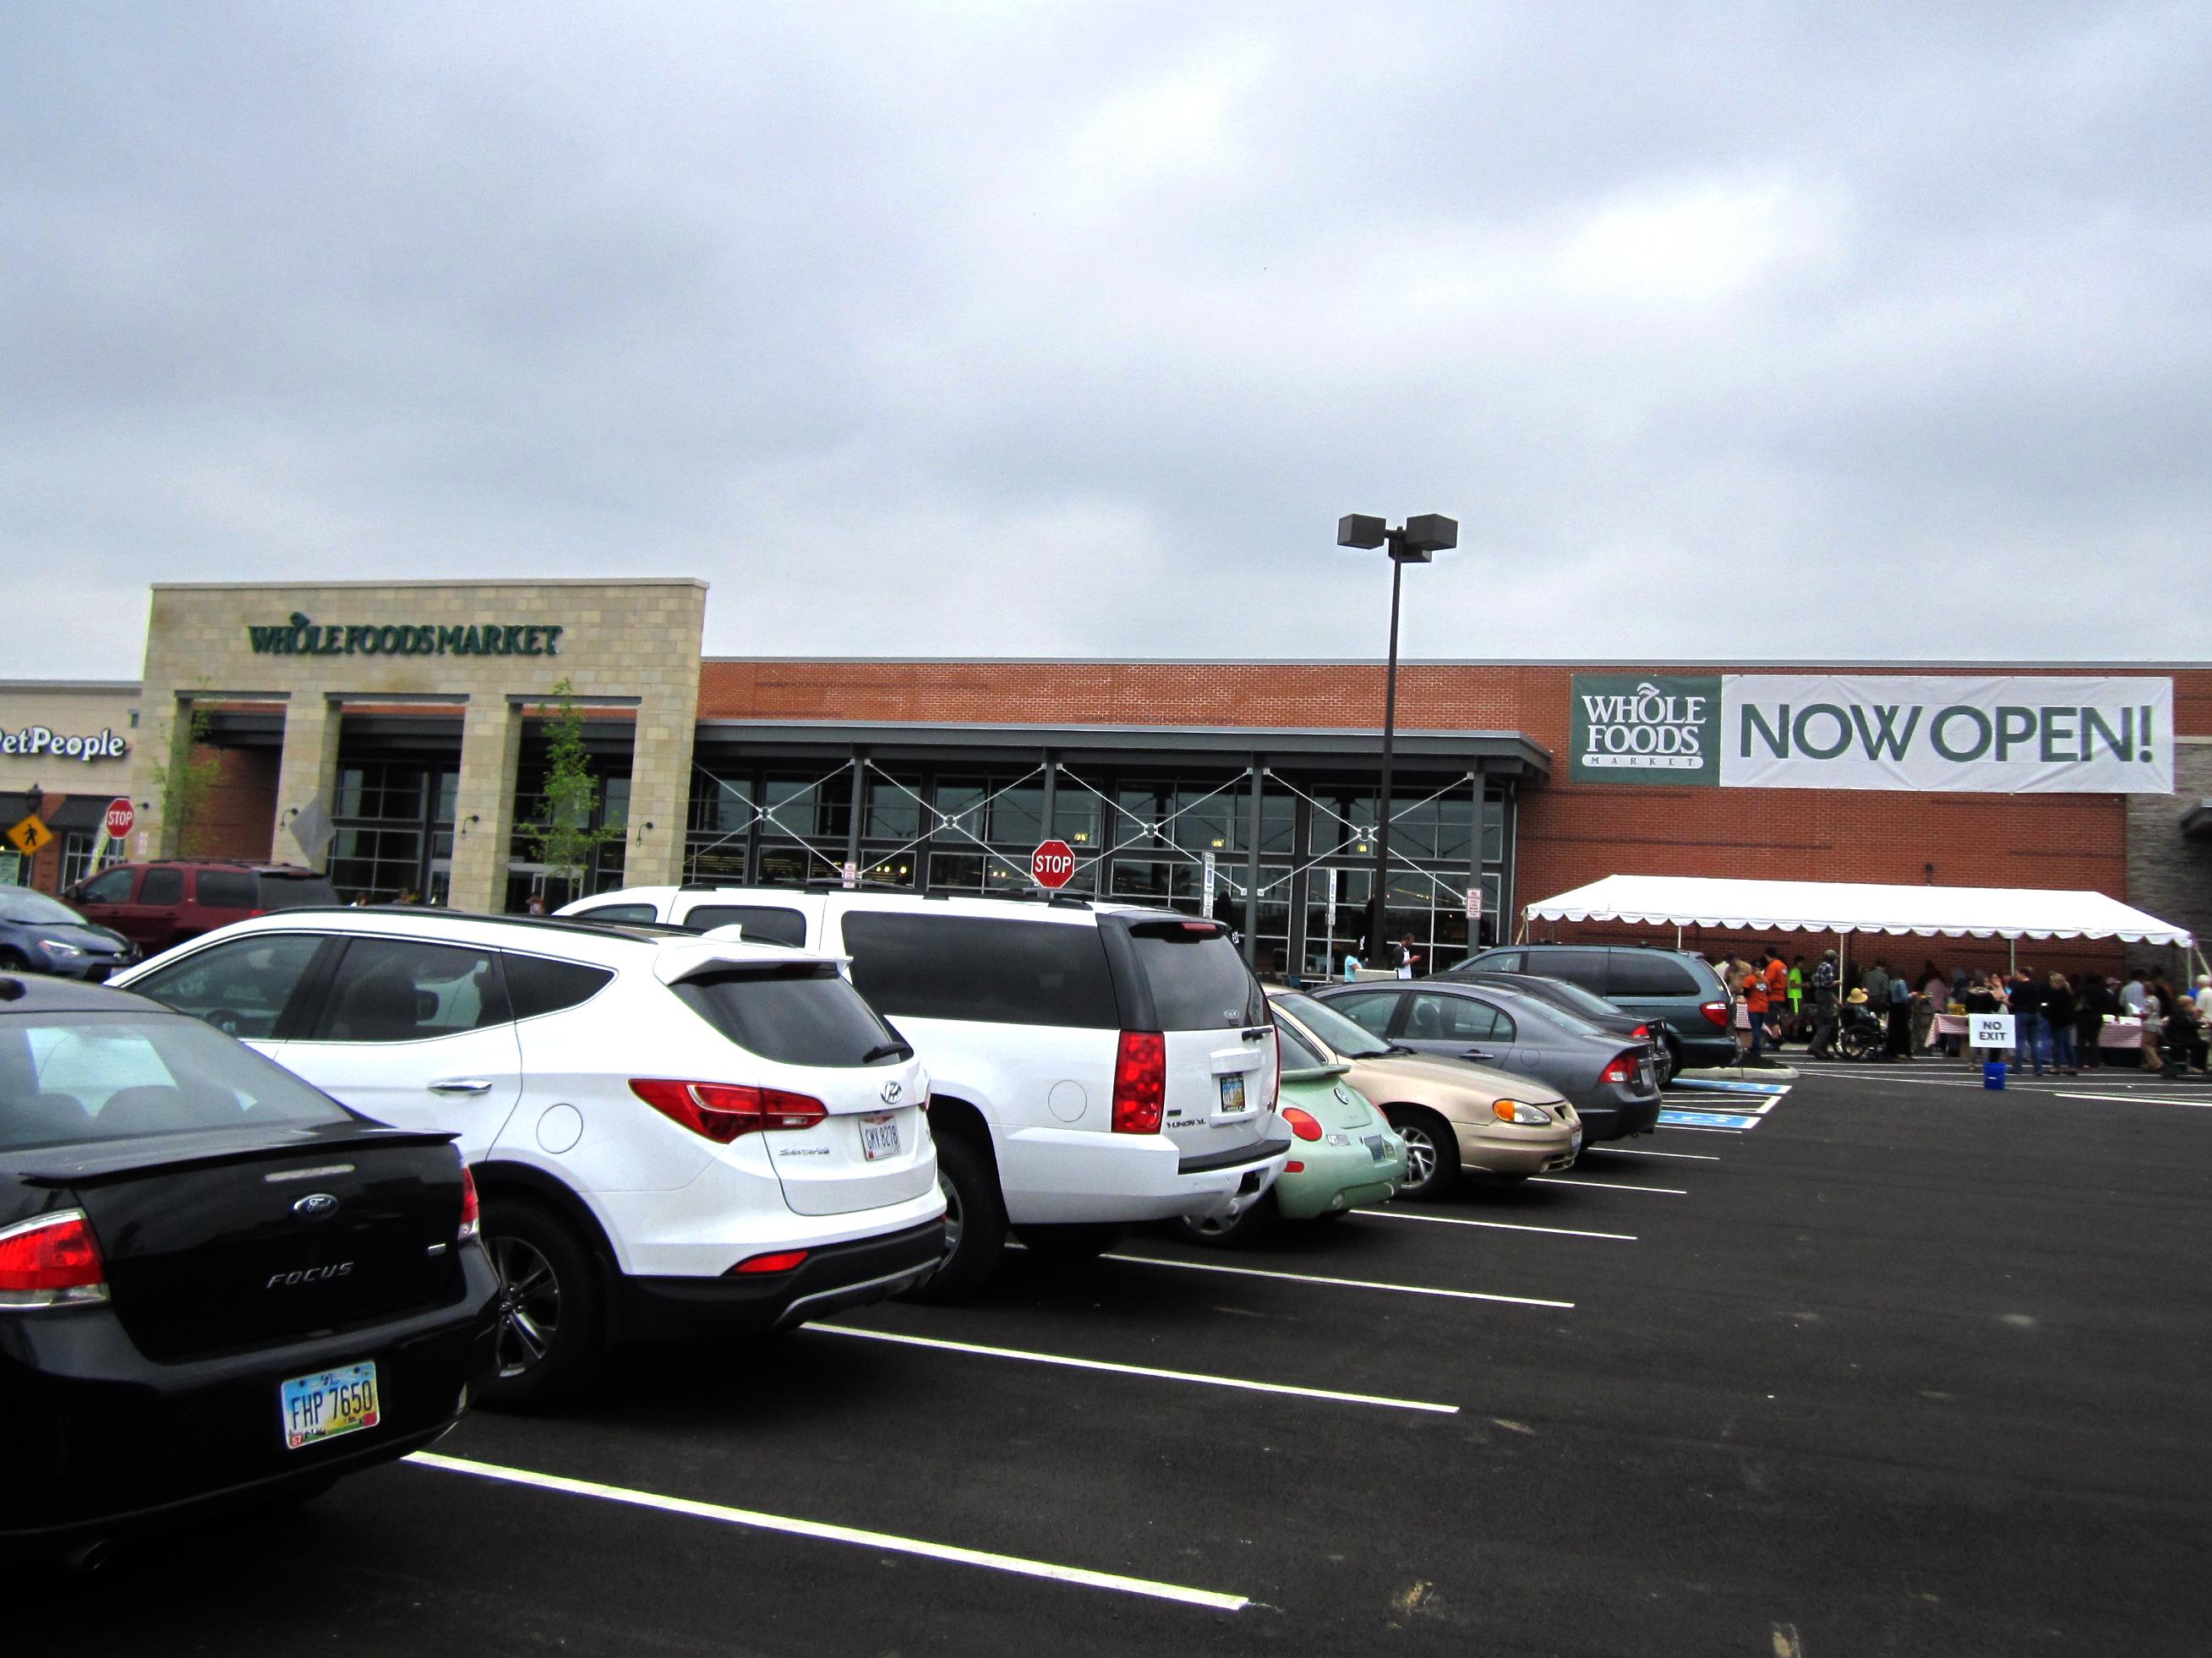 Whole Foods Market Dayton Grand Opening FRCH